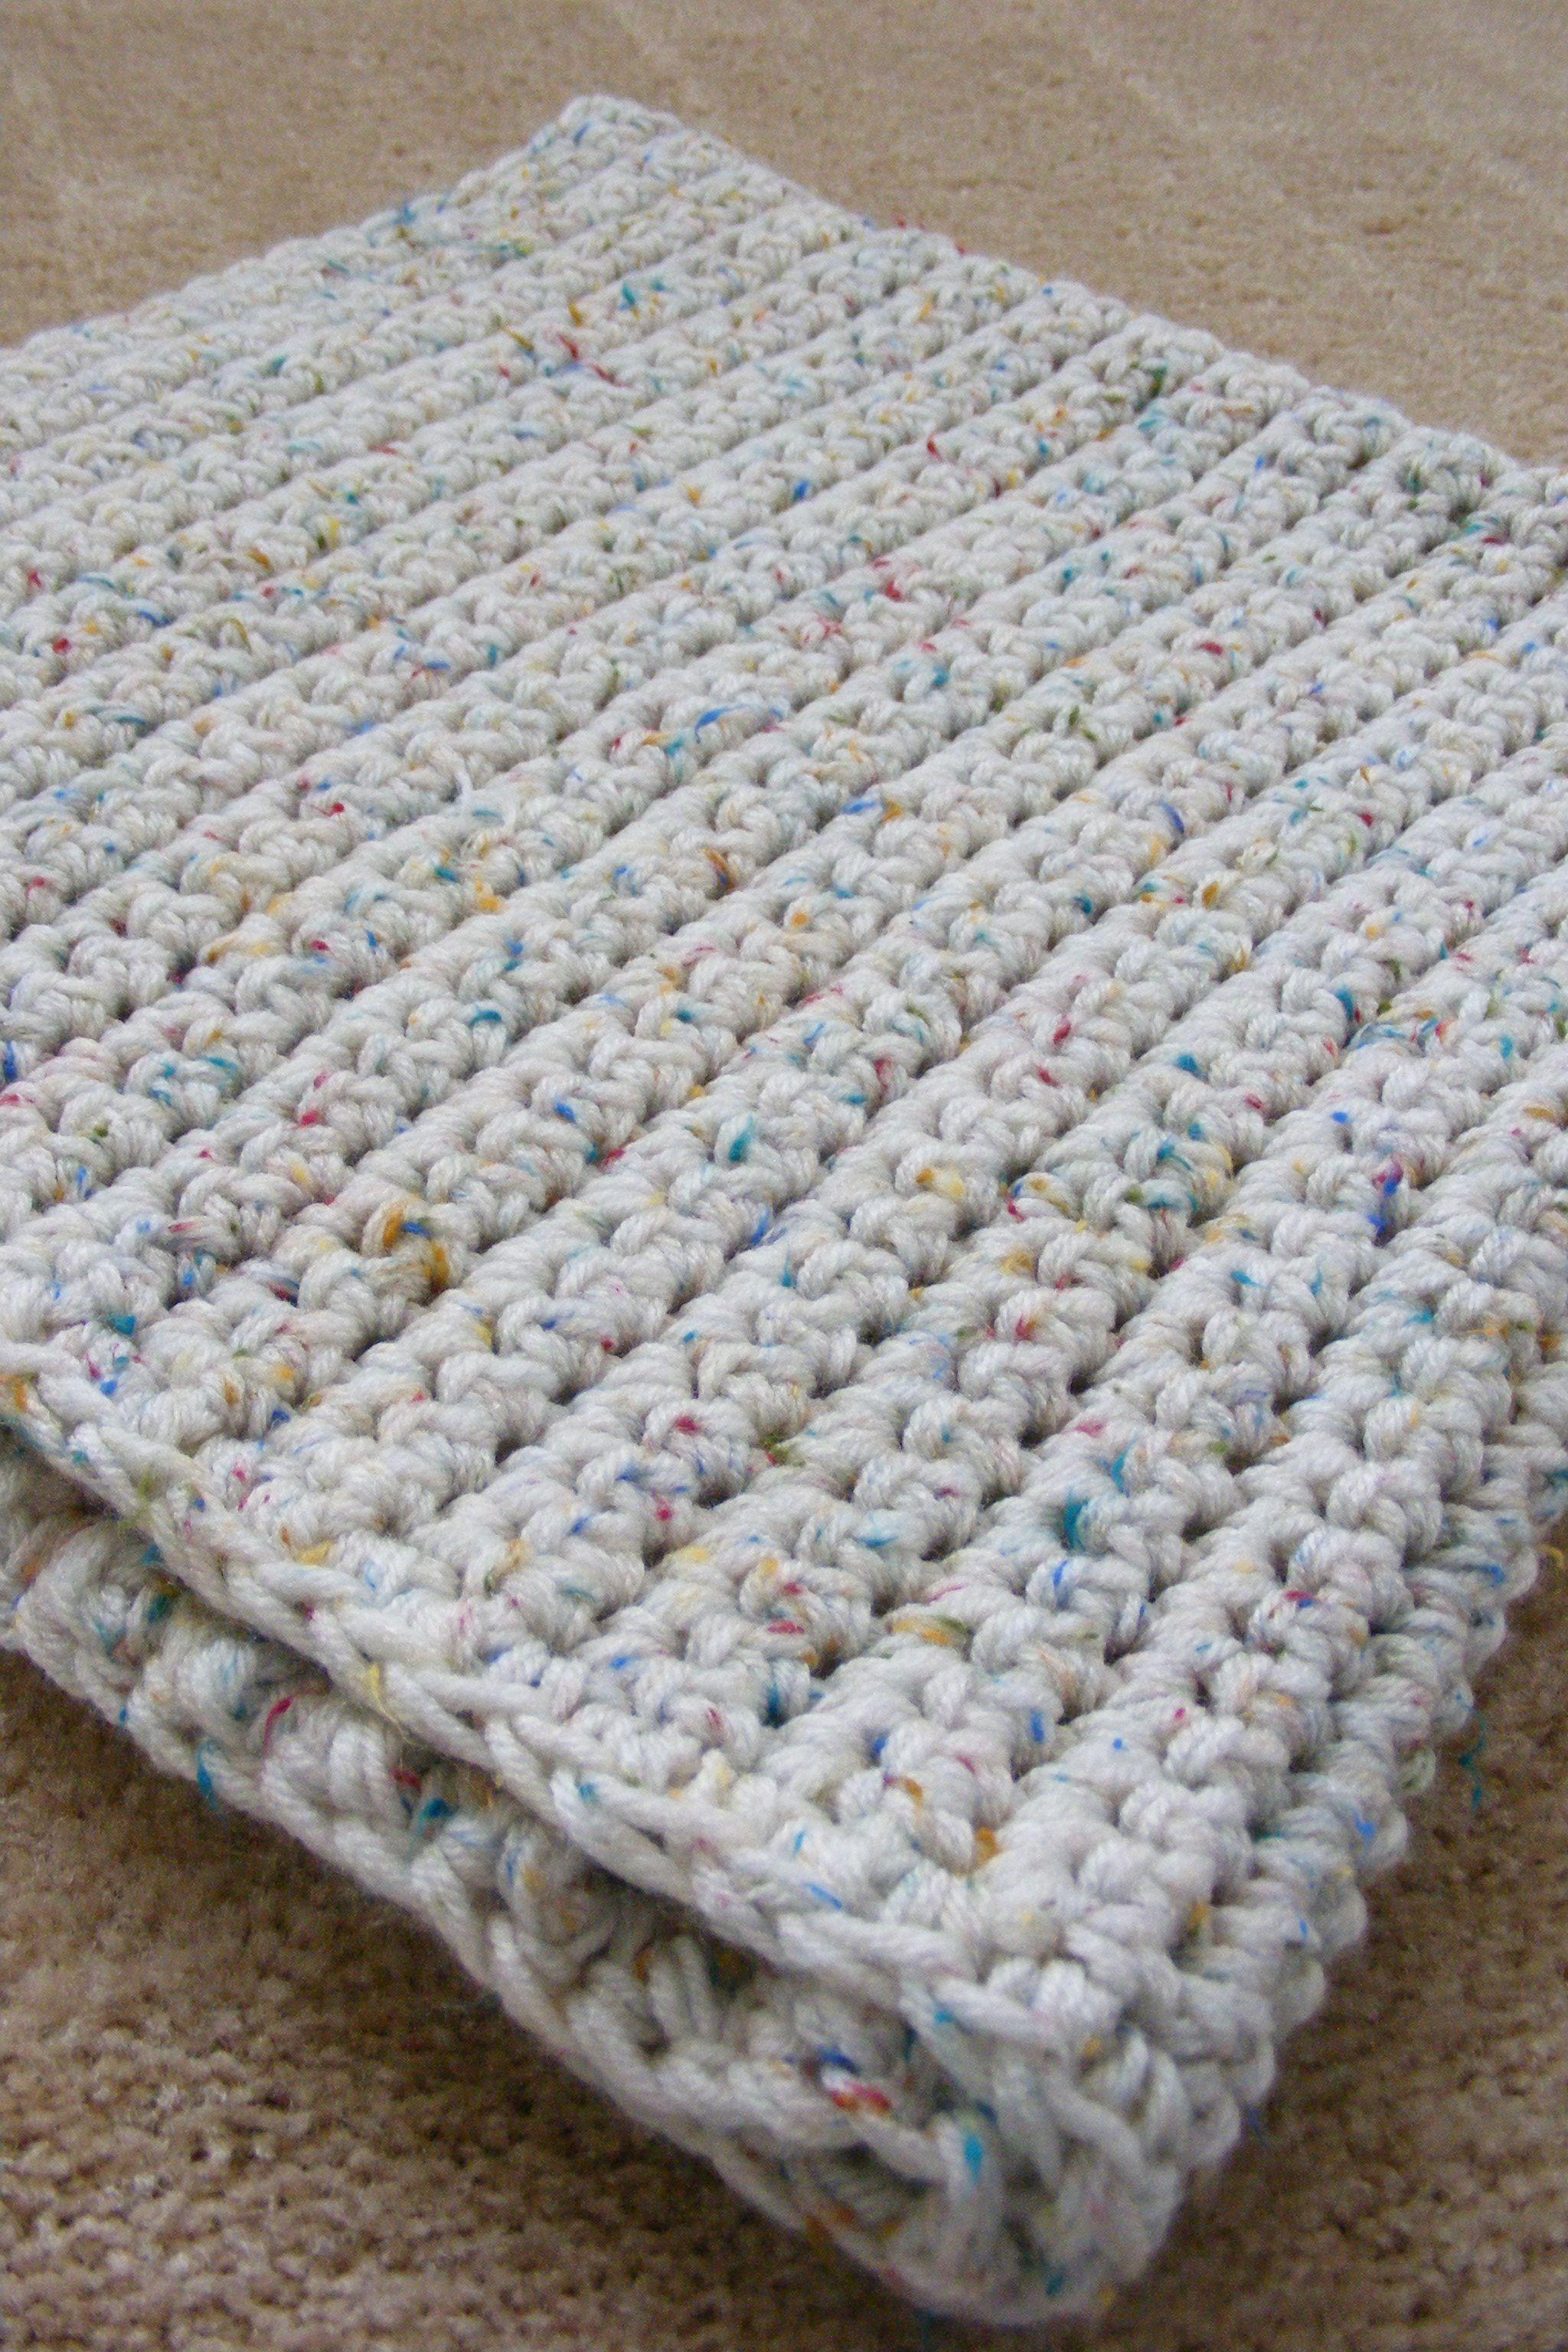 Single crochet baby blanket pattern single crochet crochet baby free crochet baby blanket patterns single crochet baby blanket pattern gretchkals yarny adventures bankloansurffo Choice Image